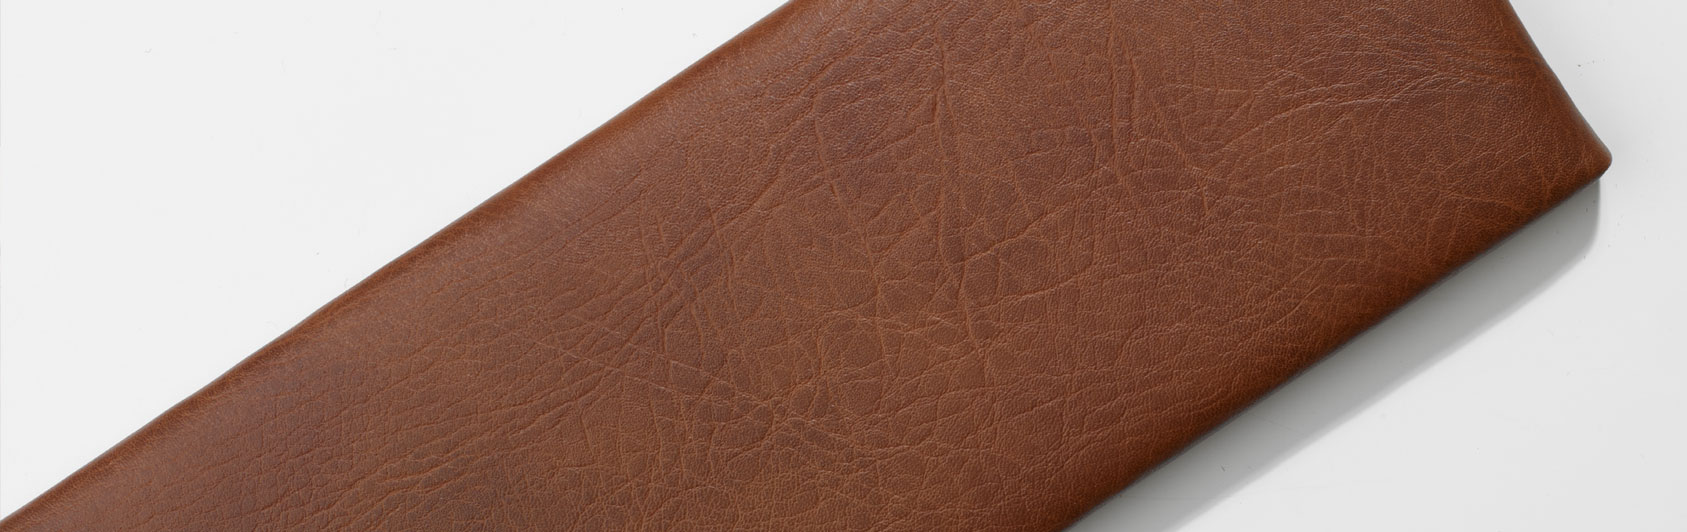 exemple agenouilloir similicuir couleur brun